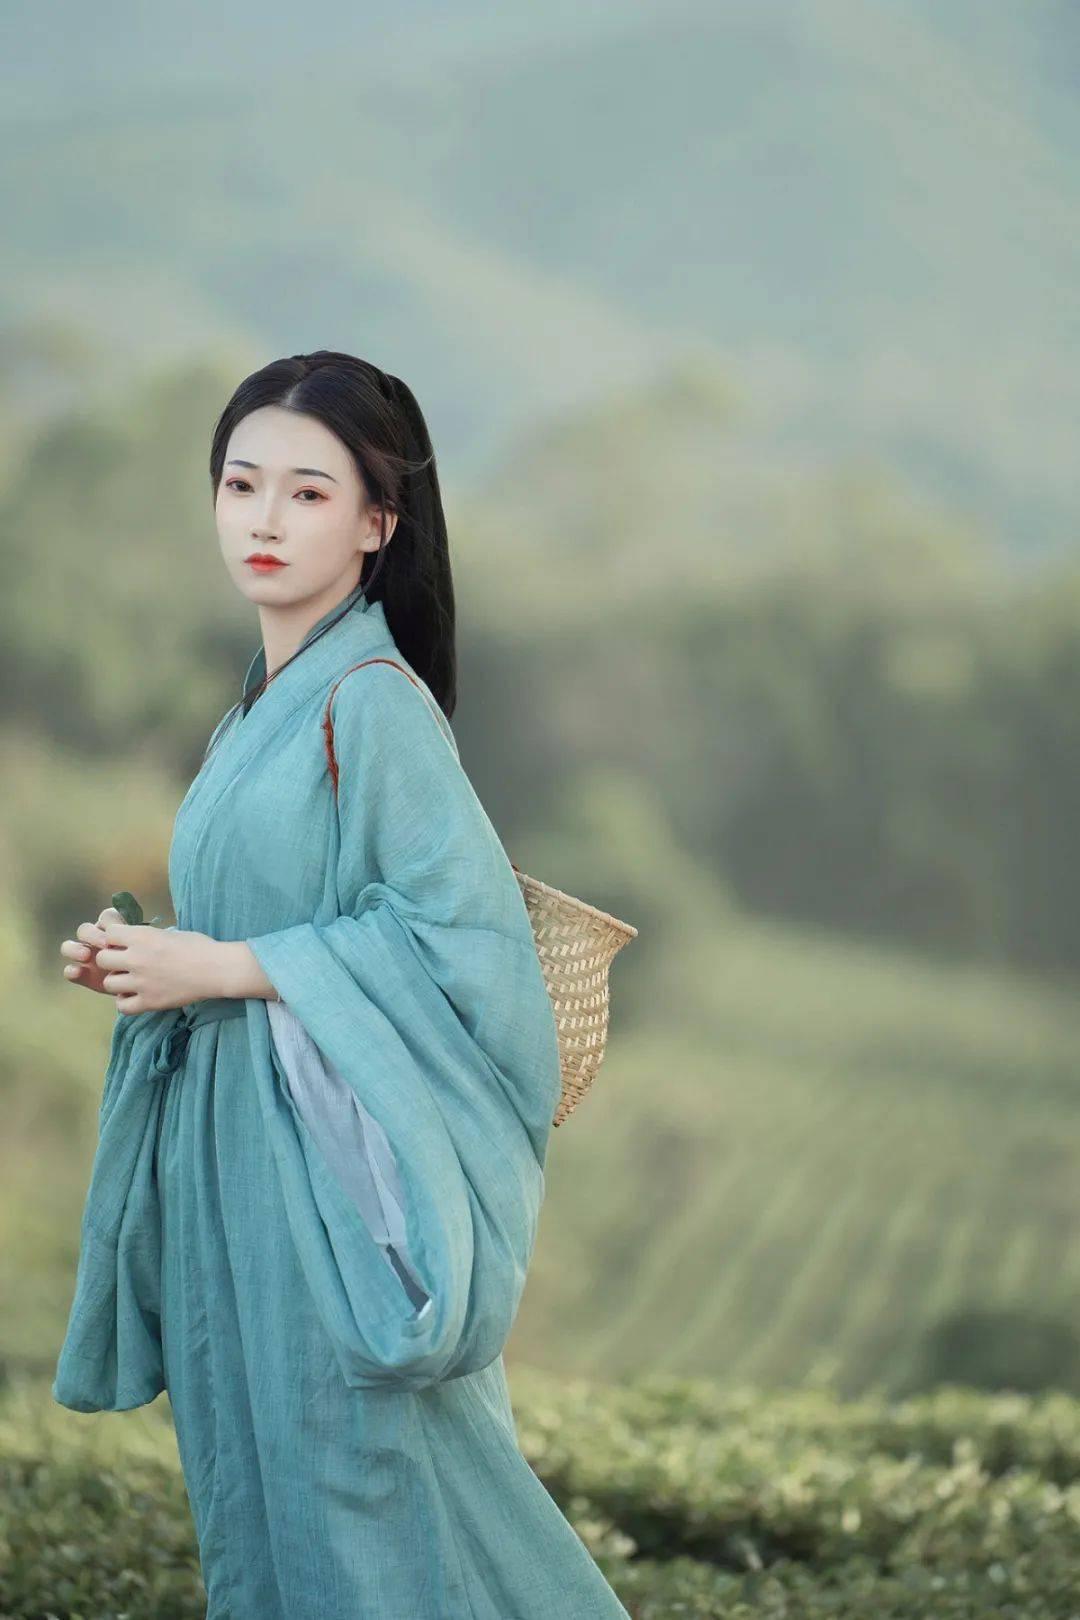 uc下一页:烟染岁月,春情如婳 网络快讯 第3张